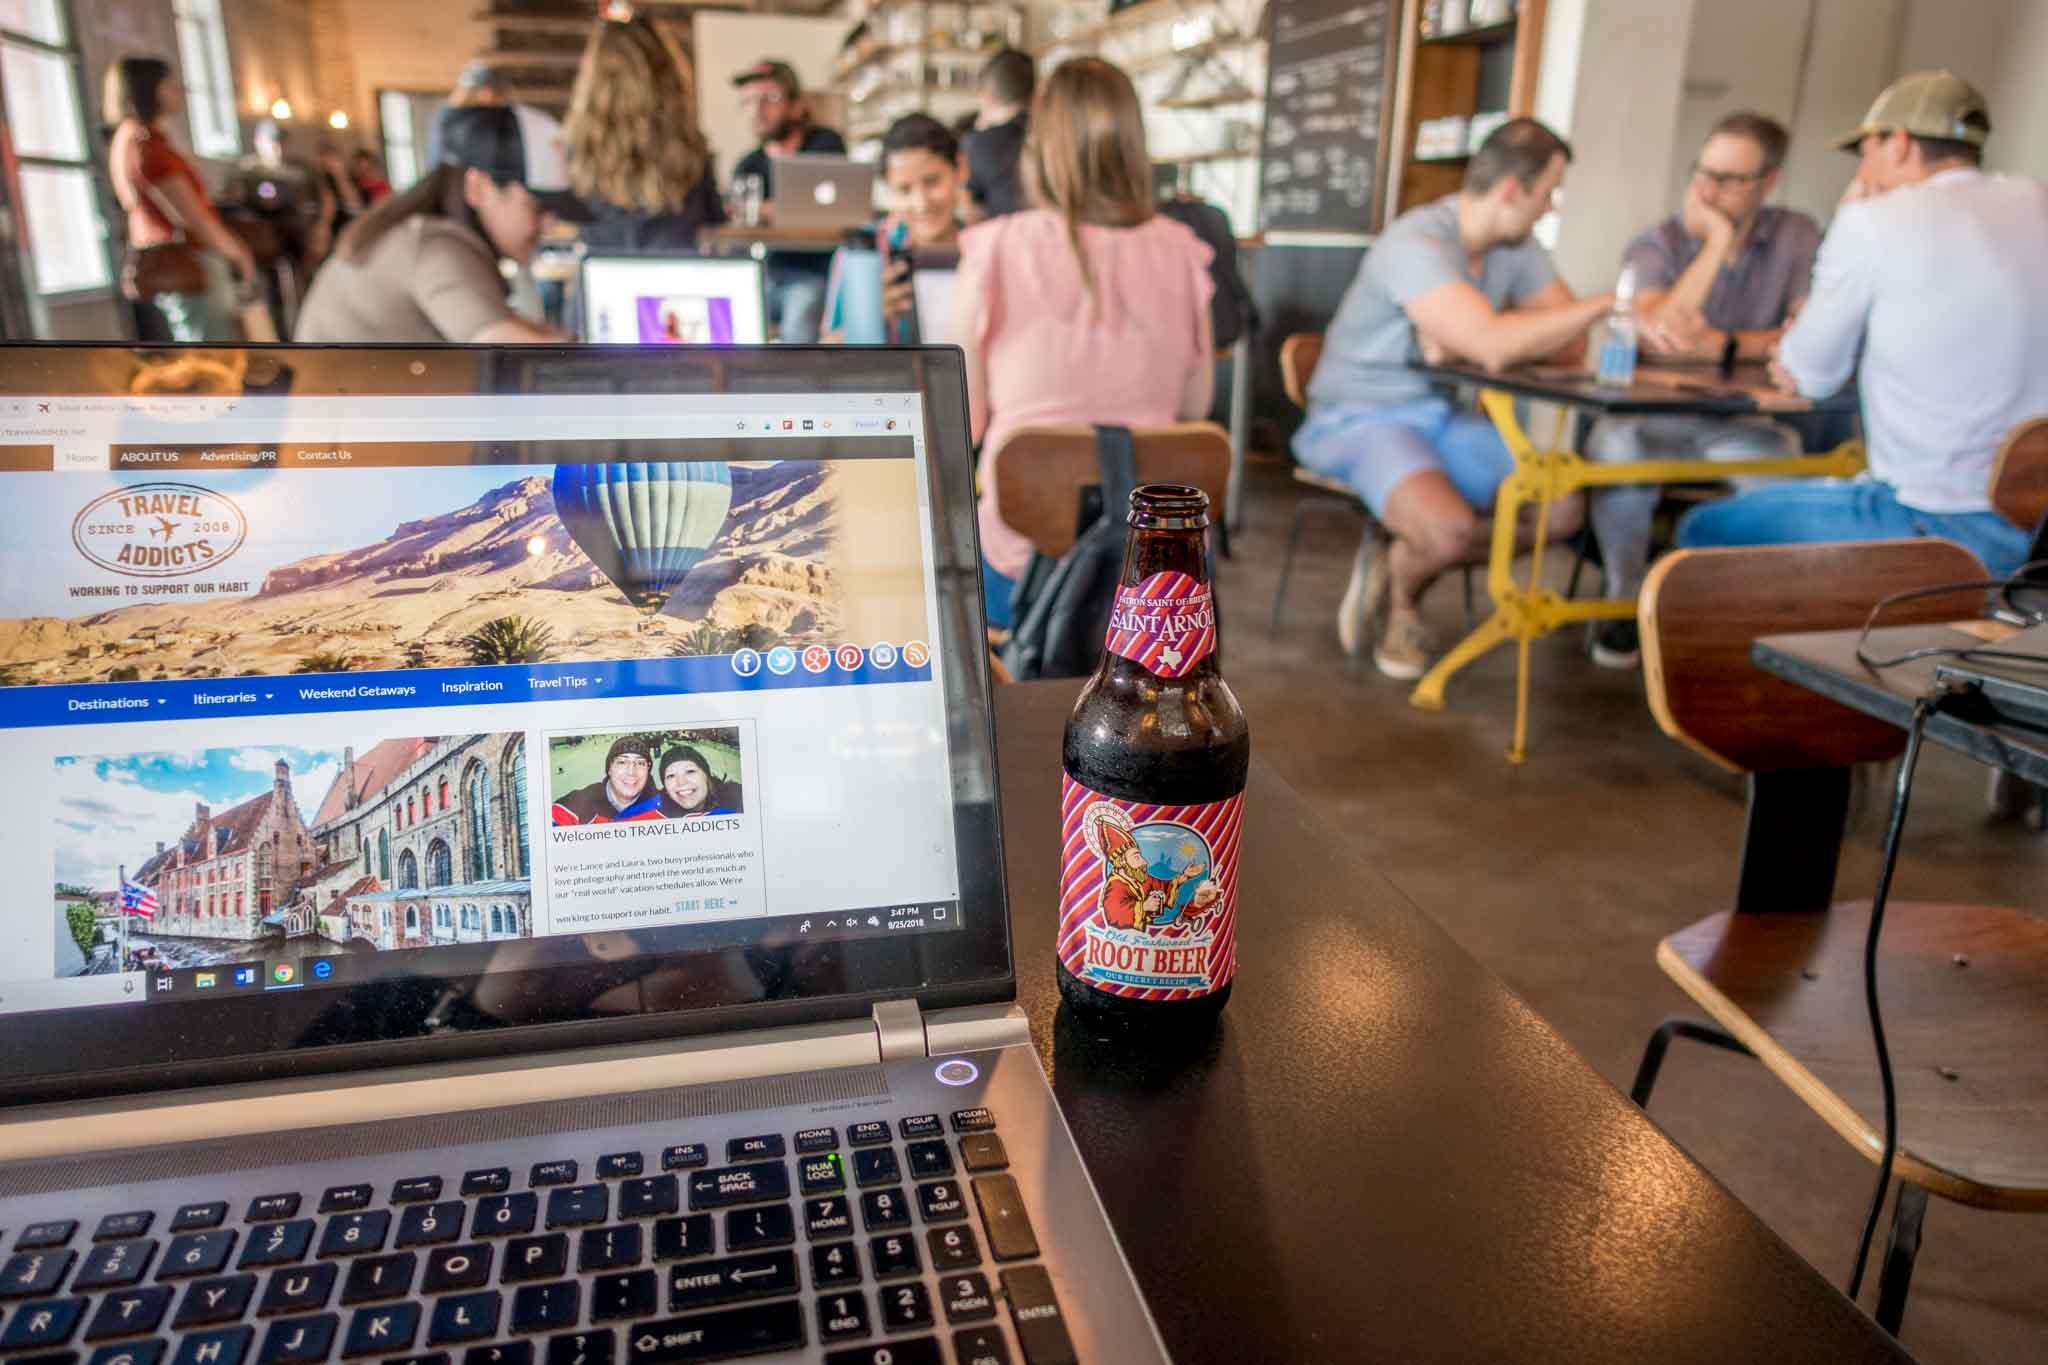 Travel Addicts blog on laptop